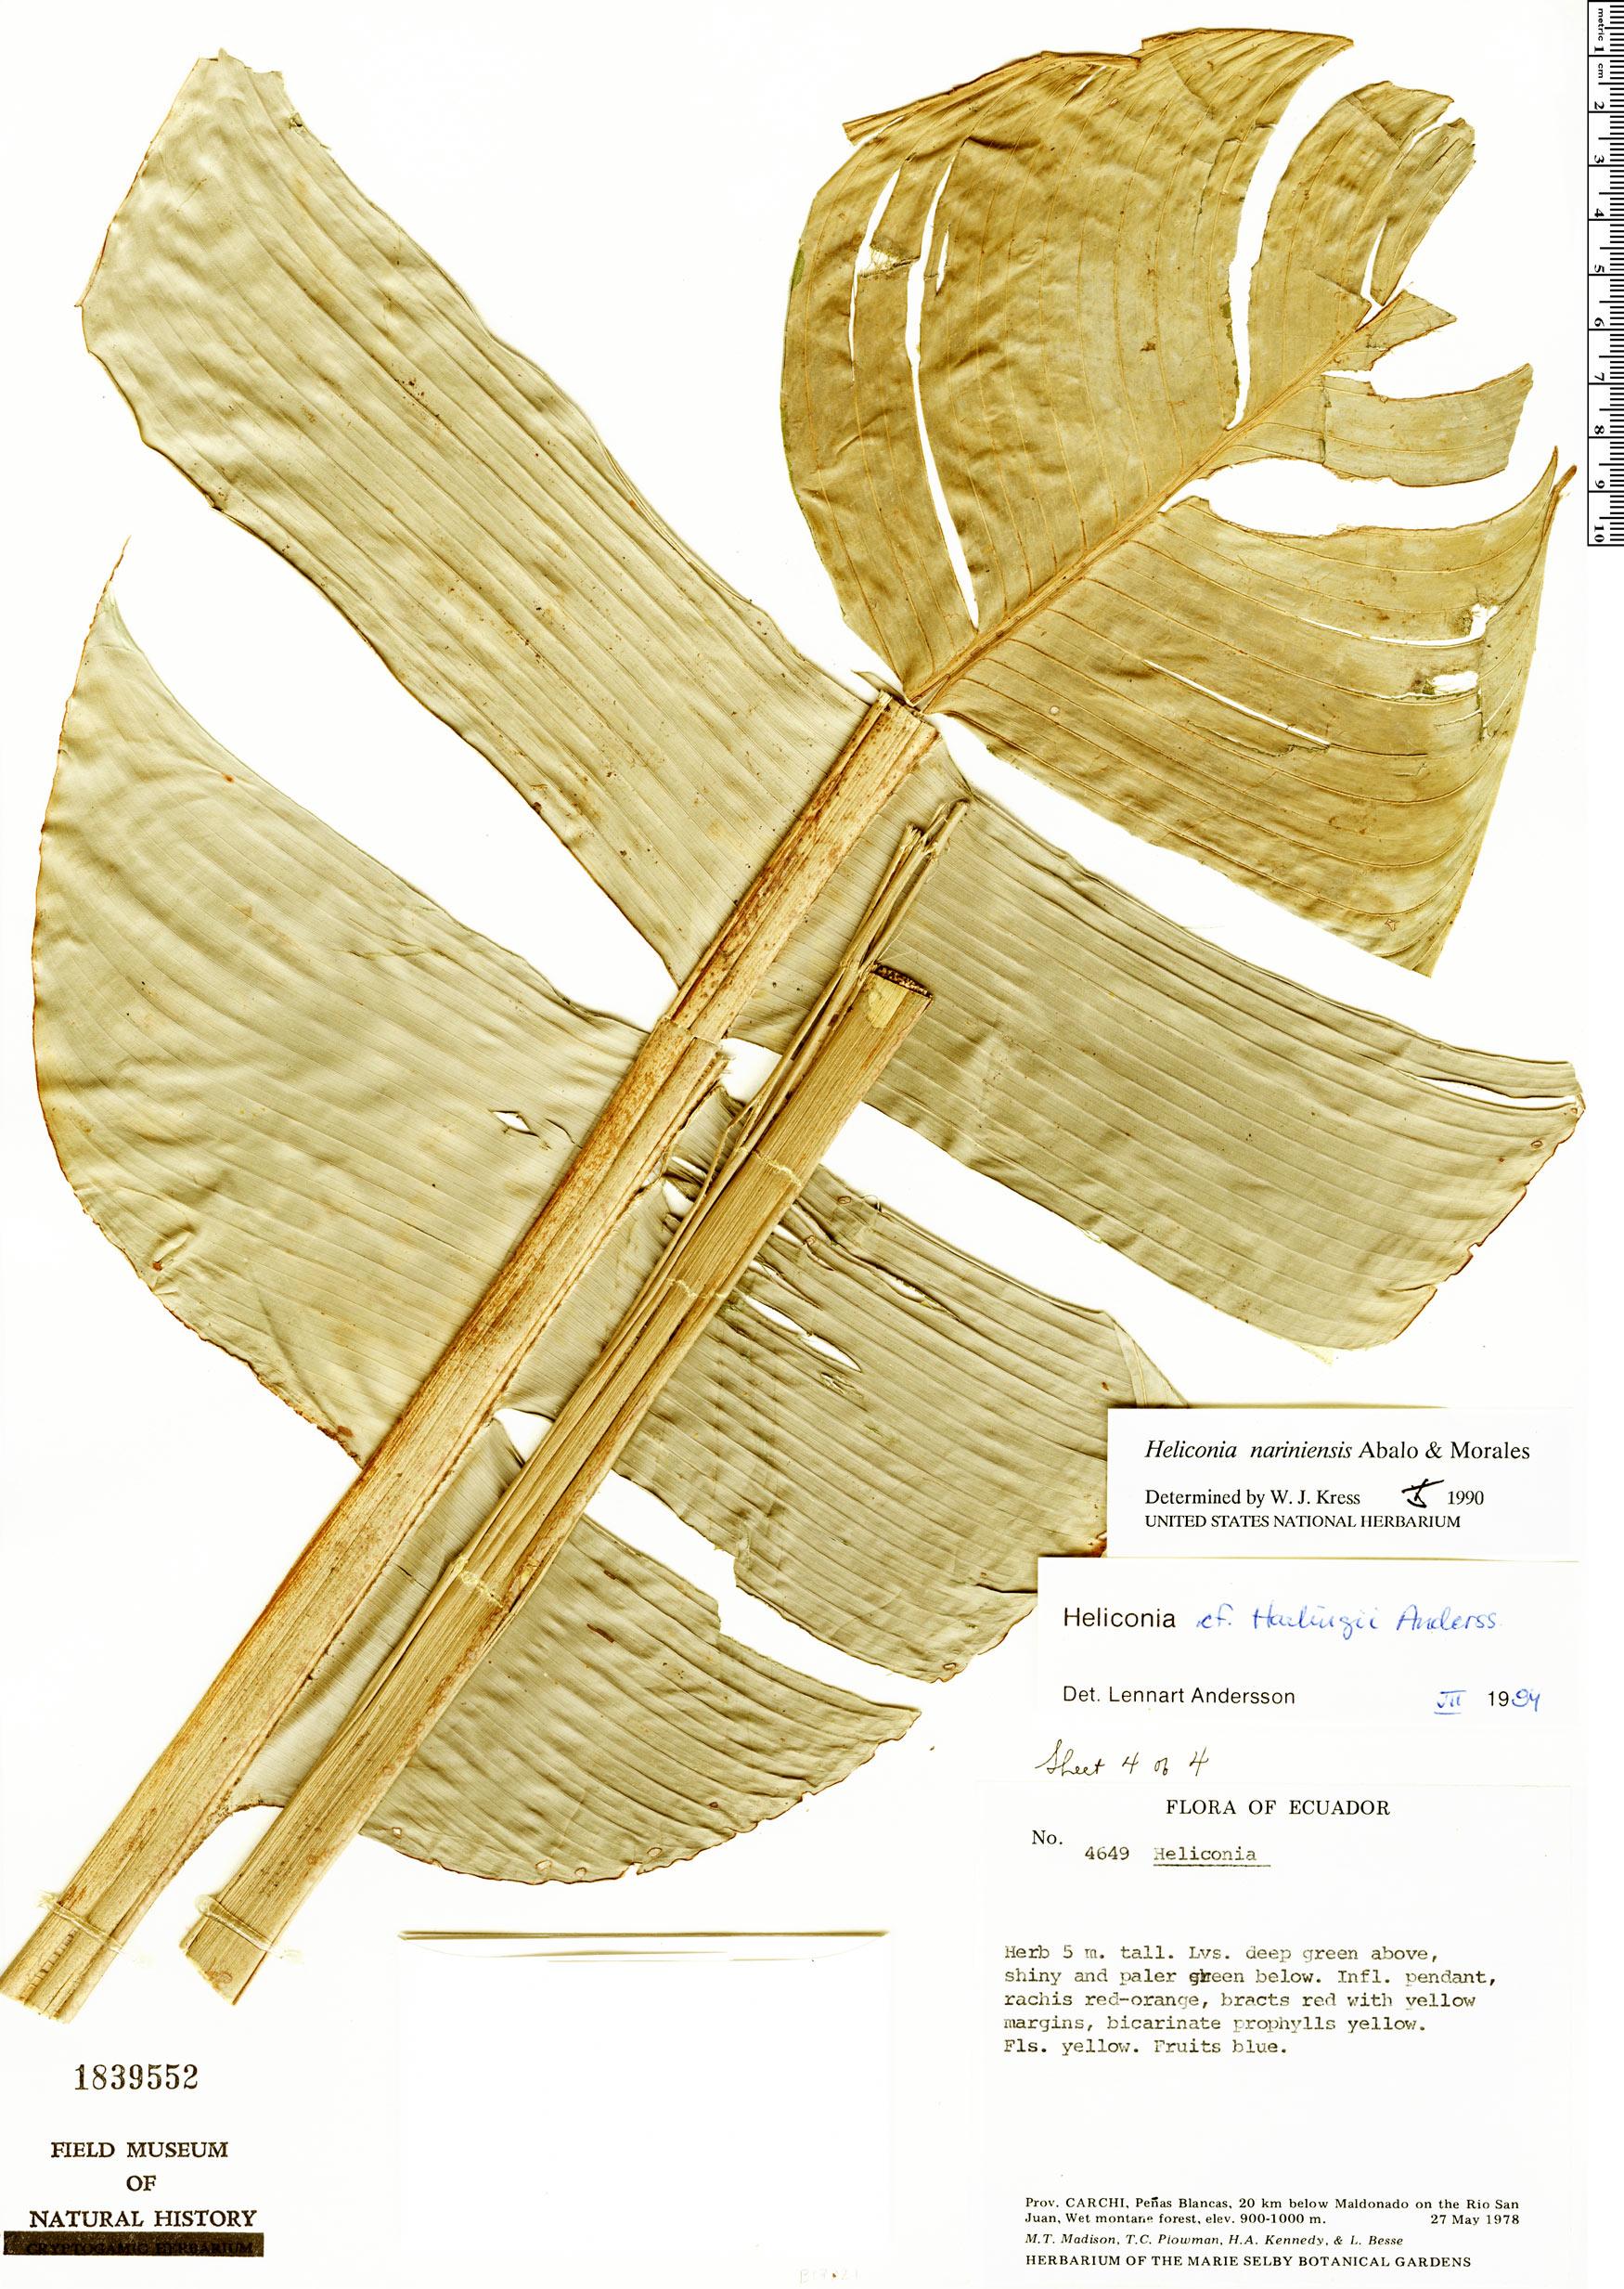 Specimen: Heliconia nariniensis